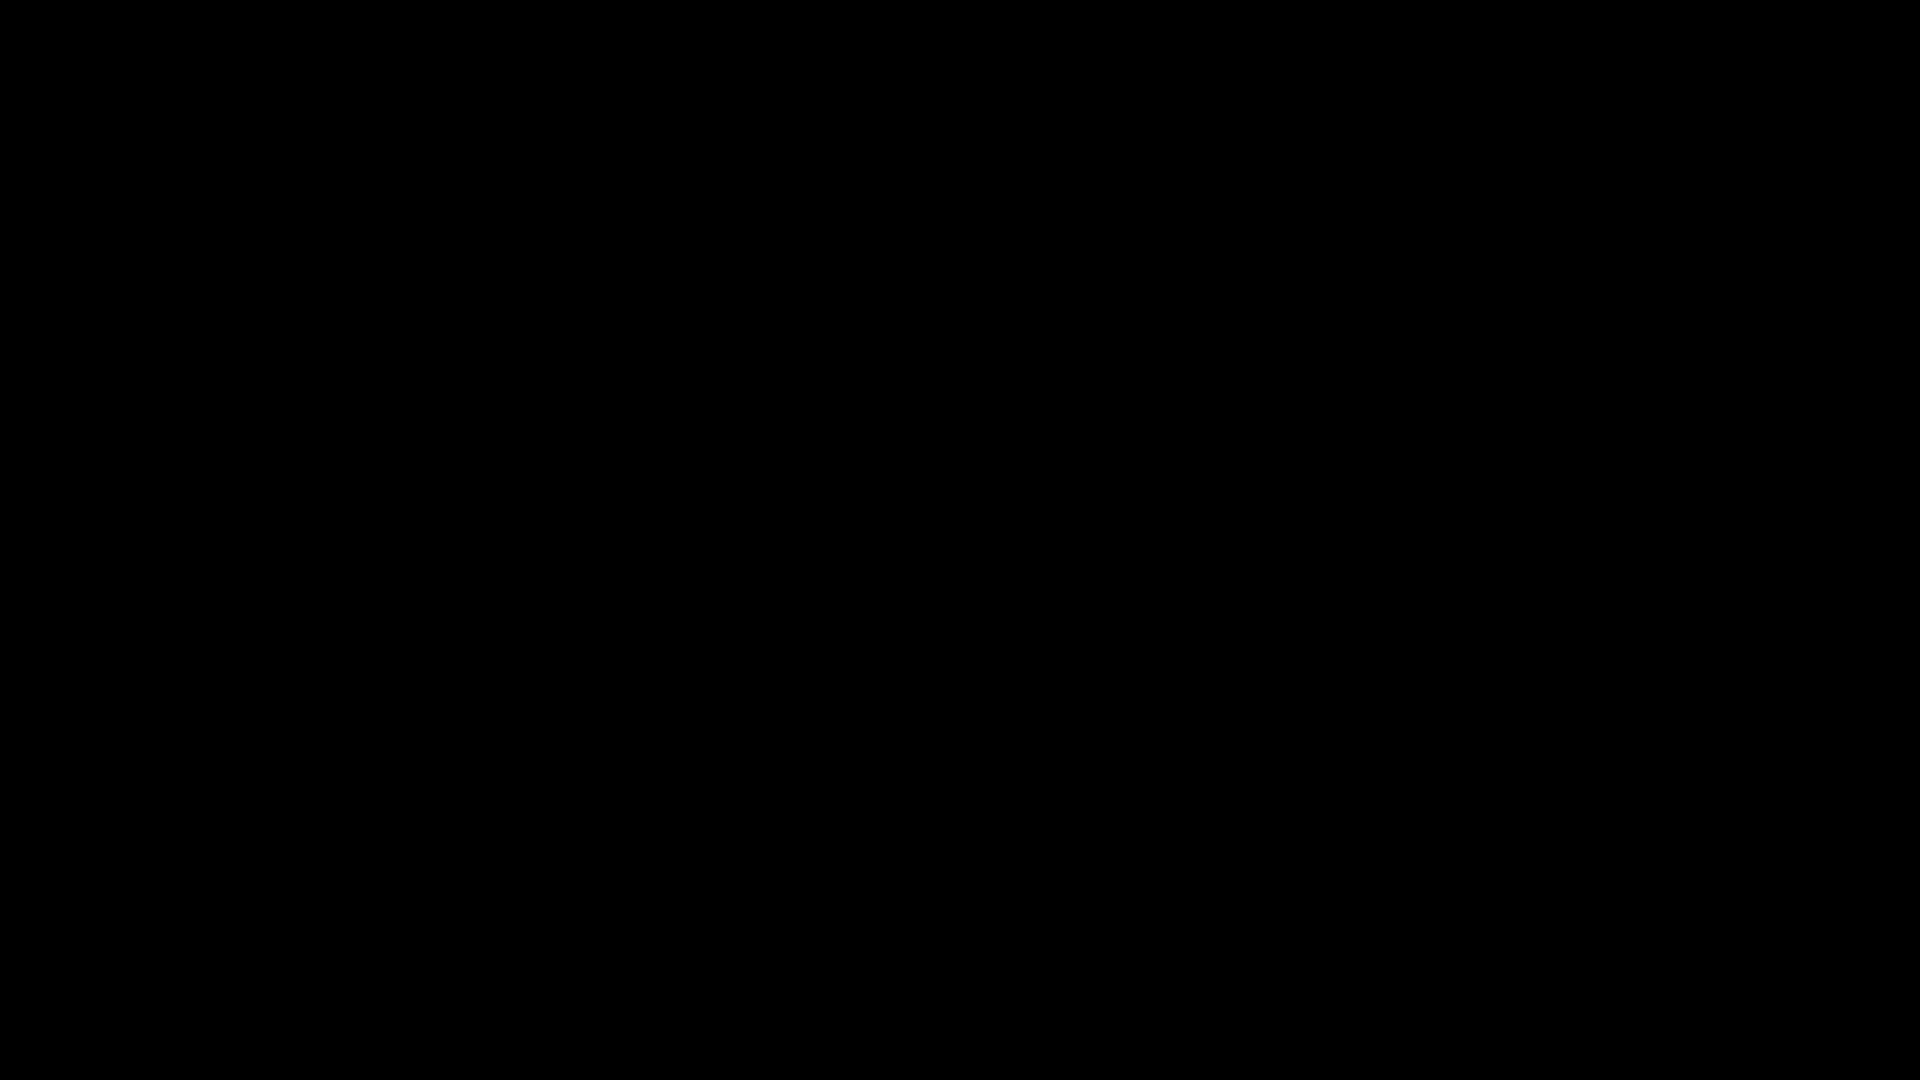 Cup, Japan, Semi-Finals, SemiFinals, boulder, bouldering, boulderingTV, climb, climbing, competition, final, finals, finger strength, hightlights, recap, replay, rock, sport, training, workout, Japan Cup of Bouldering 2019 - Finals GIFs